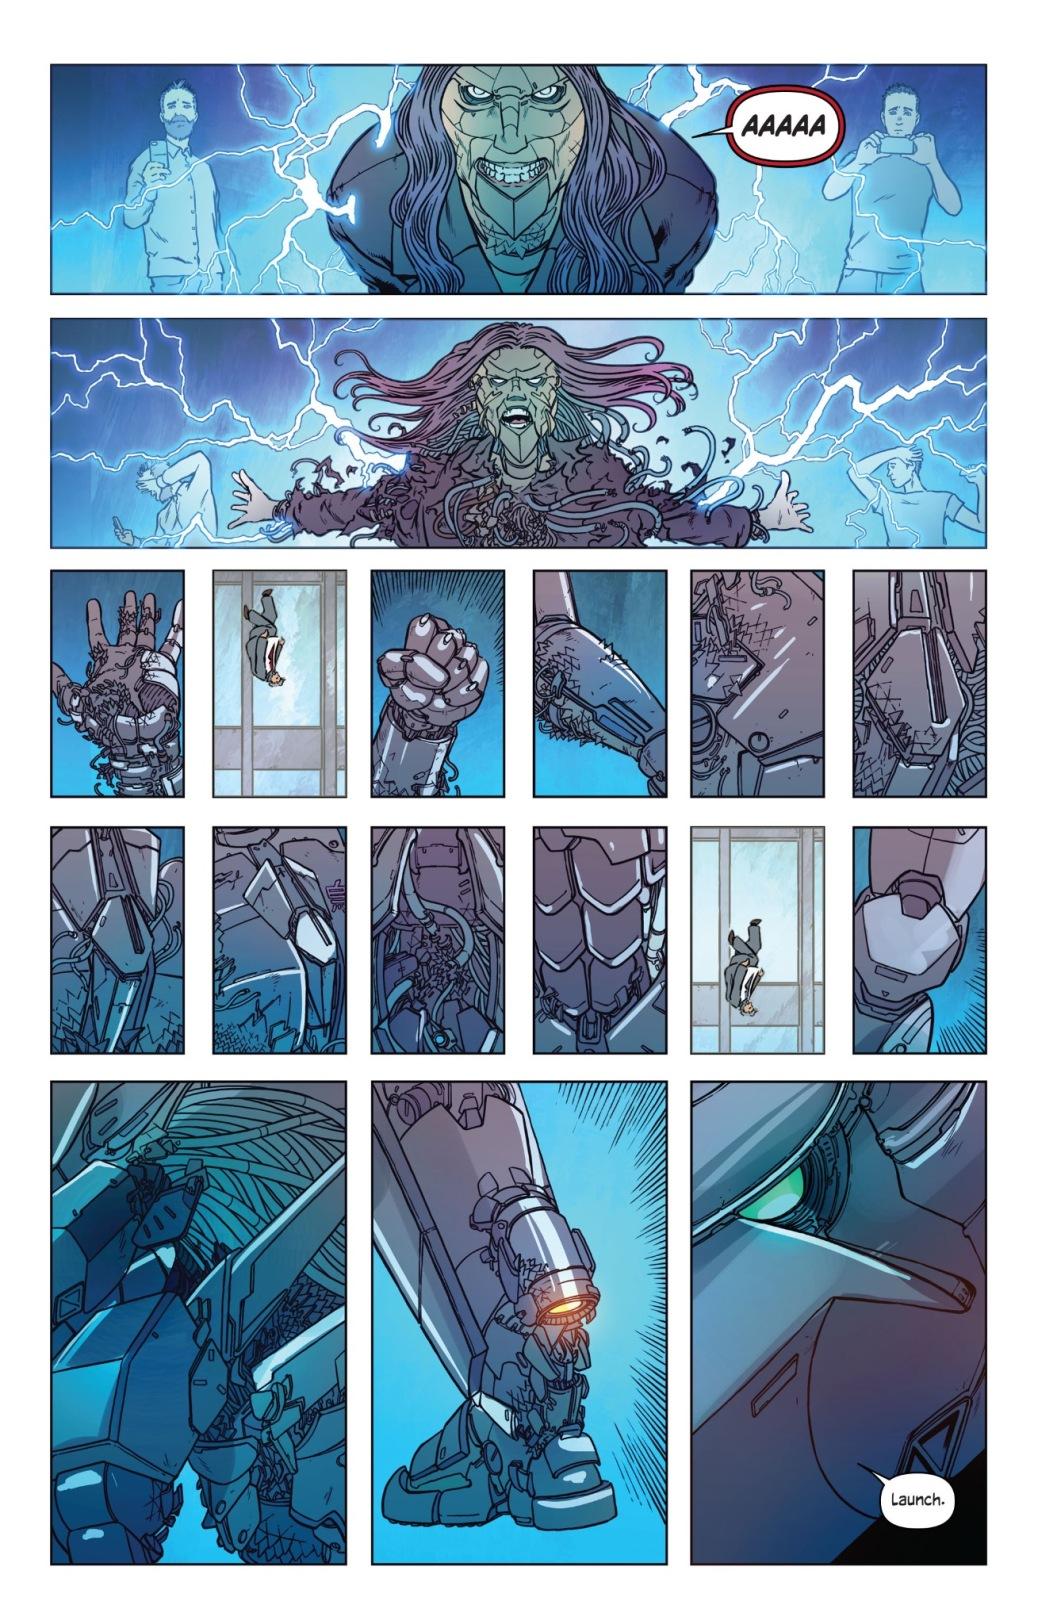 From The Wild Storm #1 by Jon Davis Hunt & Ivan Plascencia